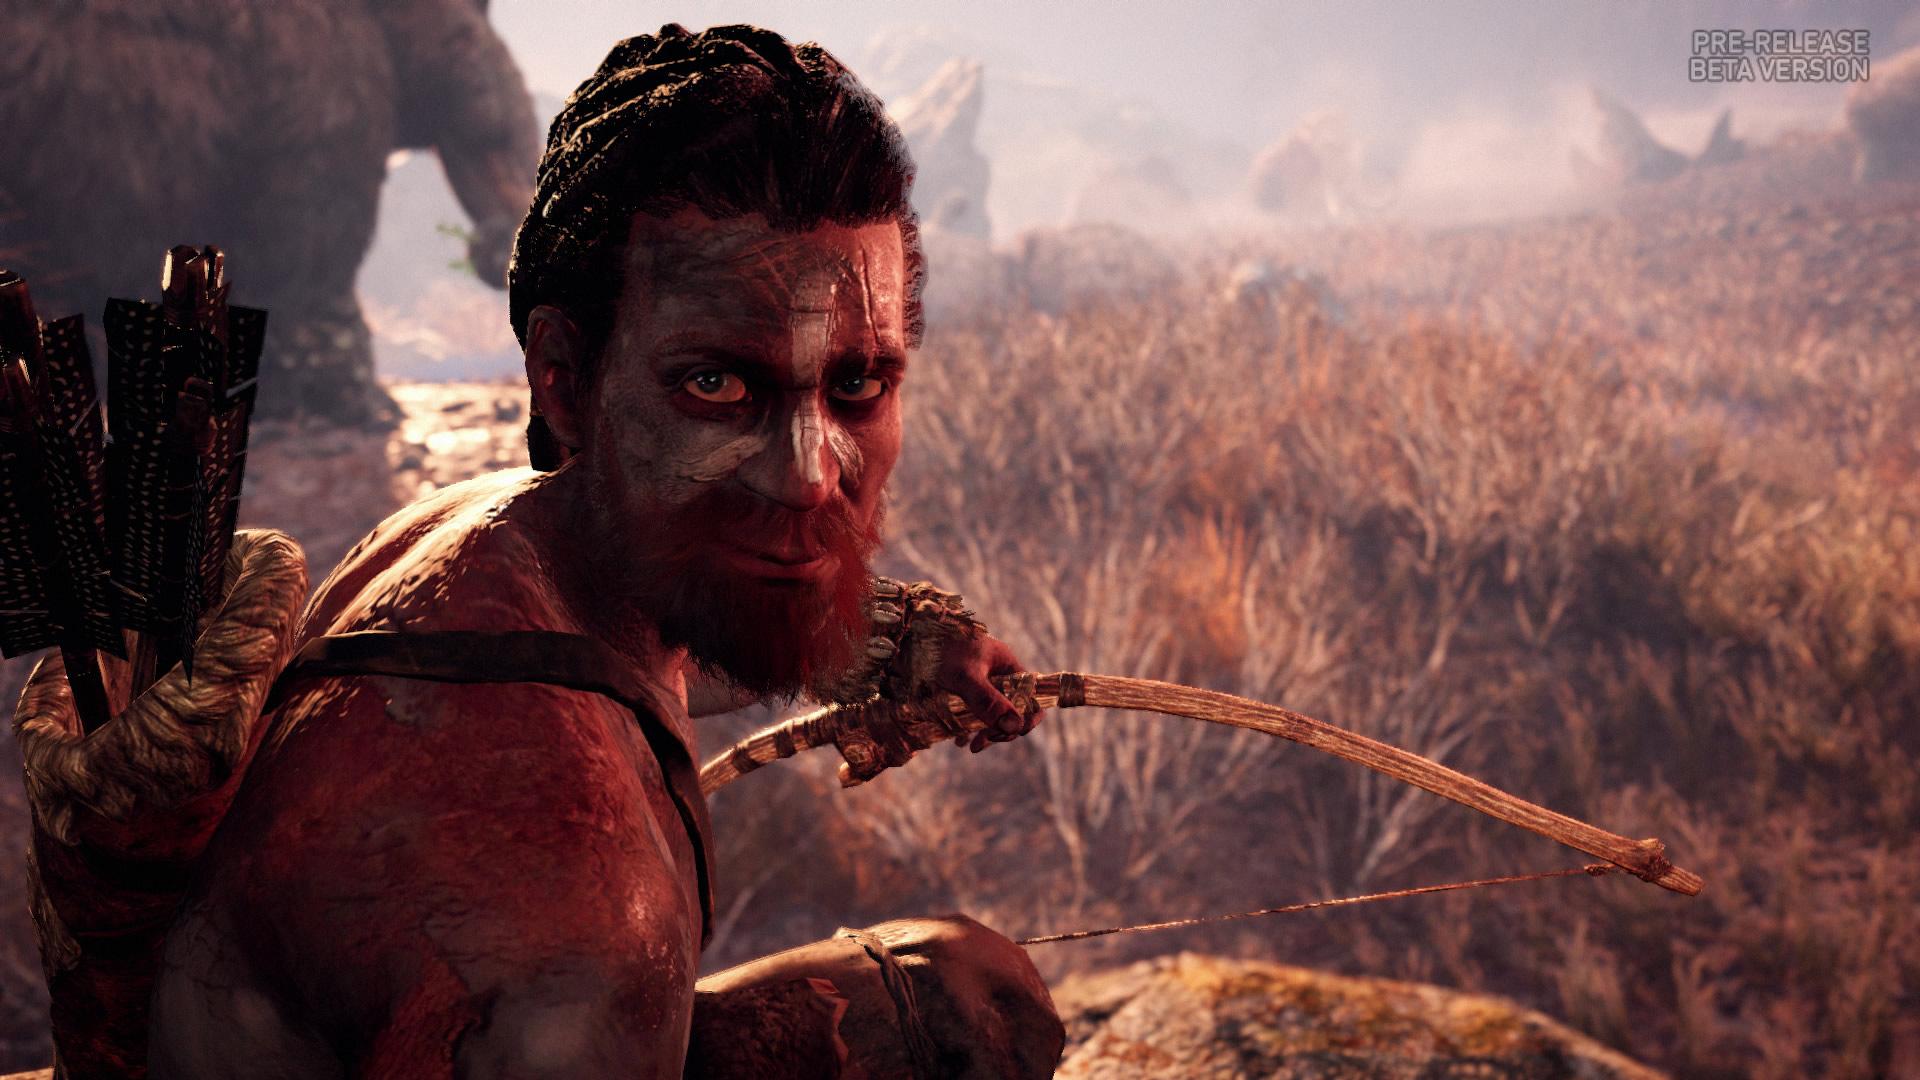 Far Cry Primal Bajo Lupa En Playstation 4 1920 X 1080p At 30 Fps